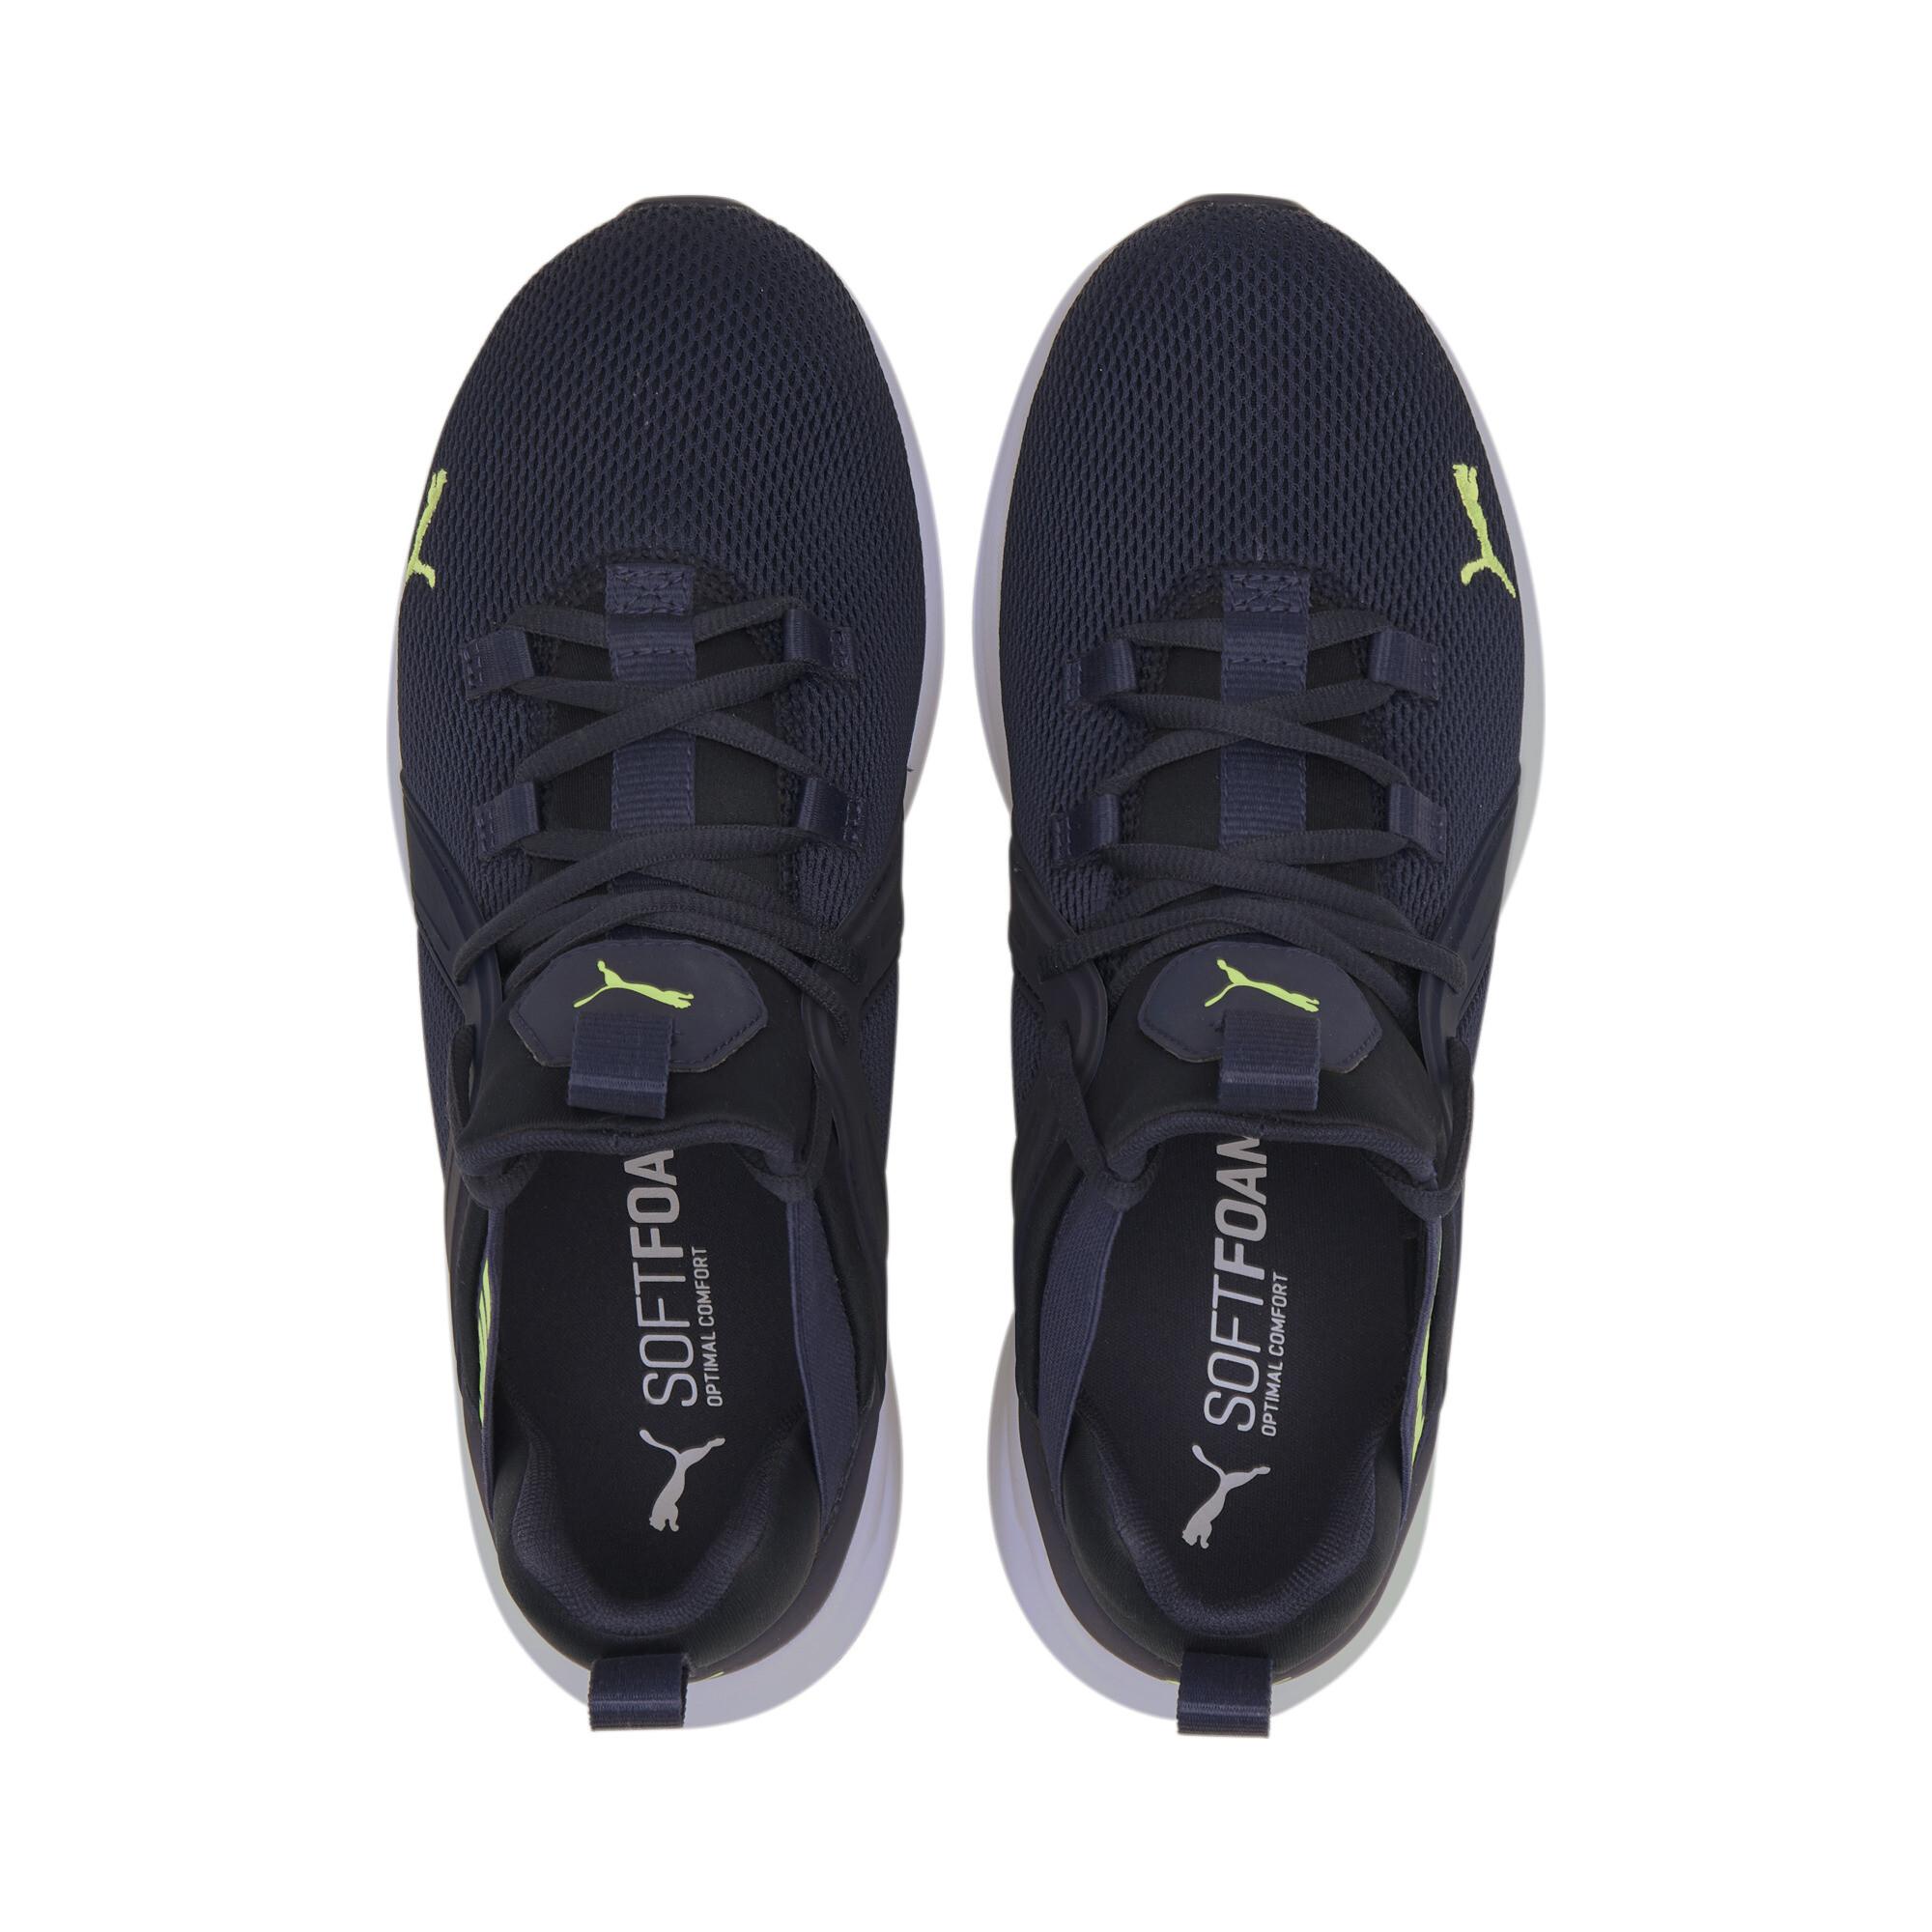 thumbnail 27 - PUMA Men's Enzo 2 Training Shoes